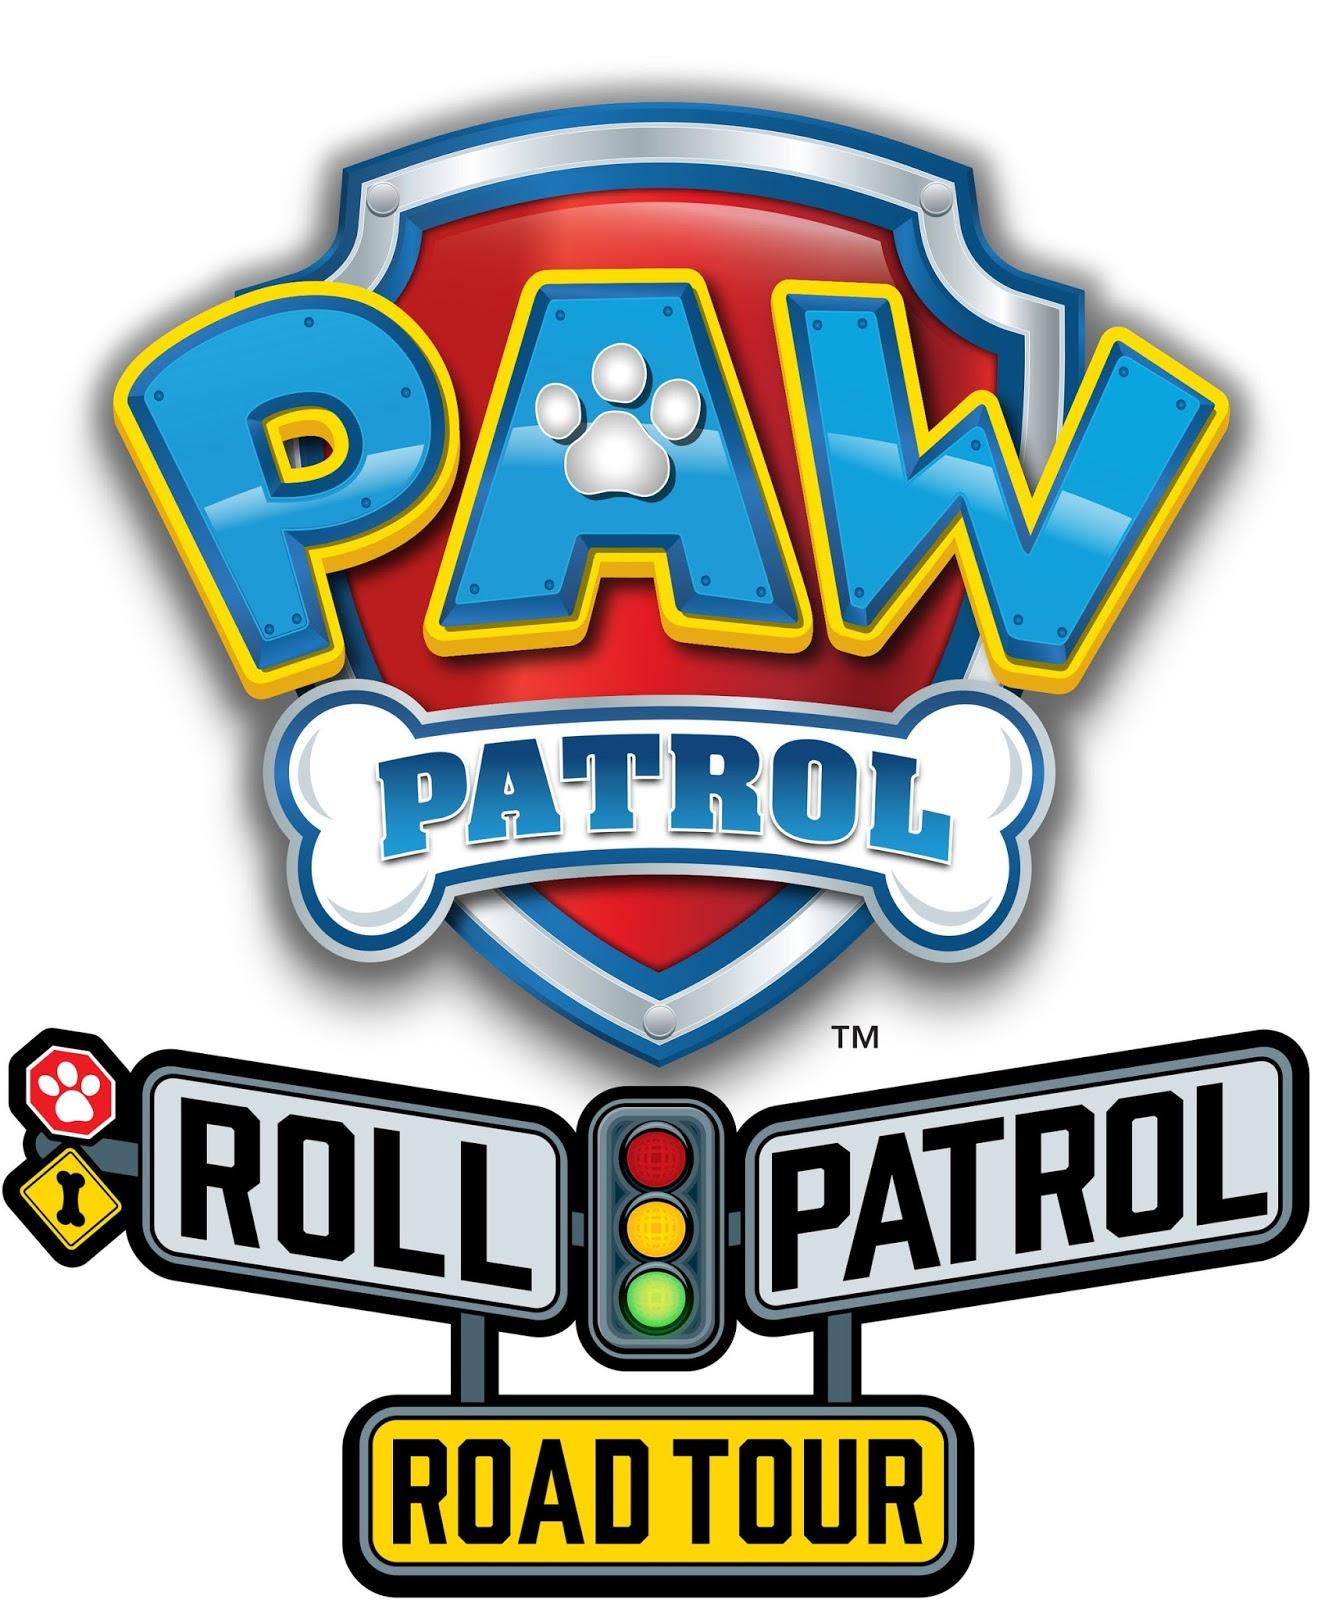 nickalive paw patrol roll patrol road tour lands in